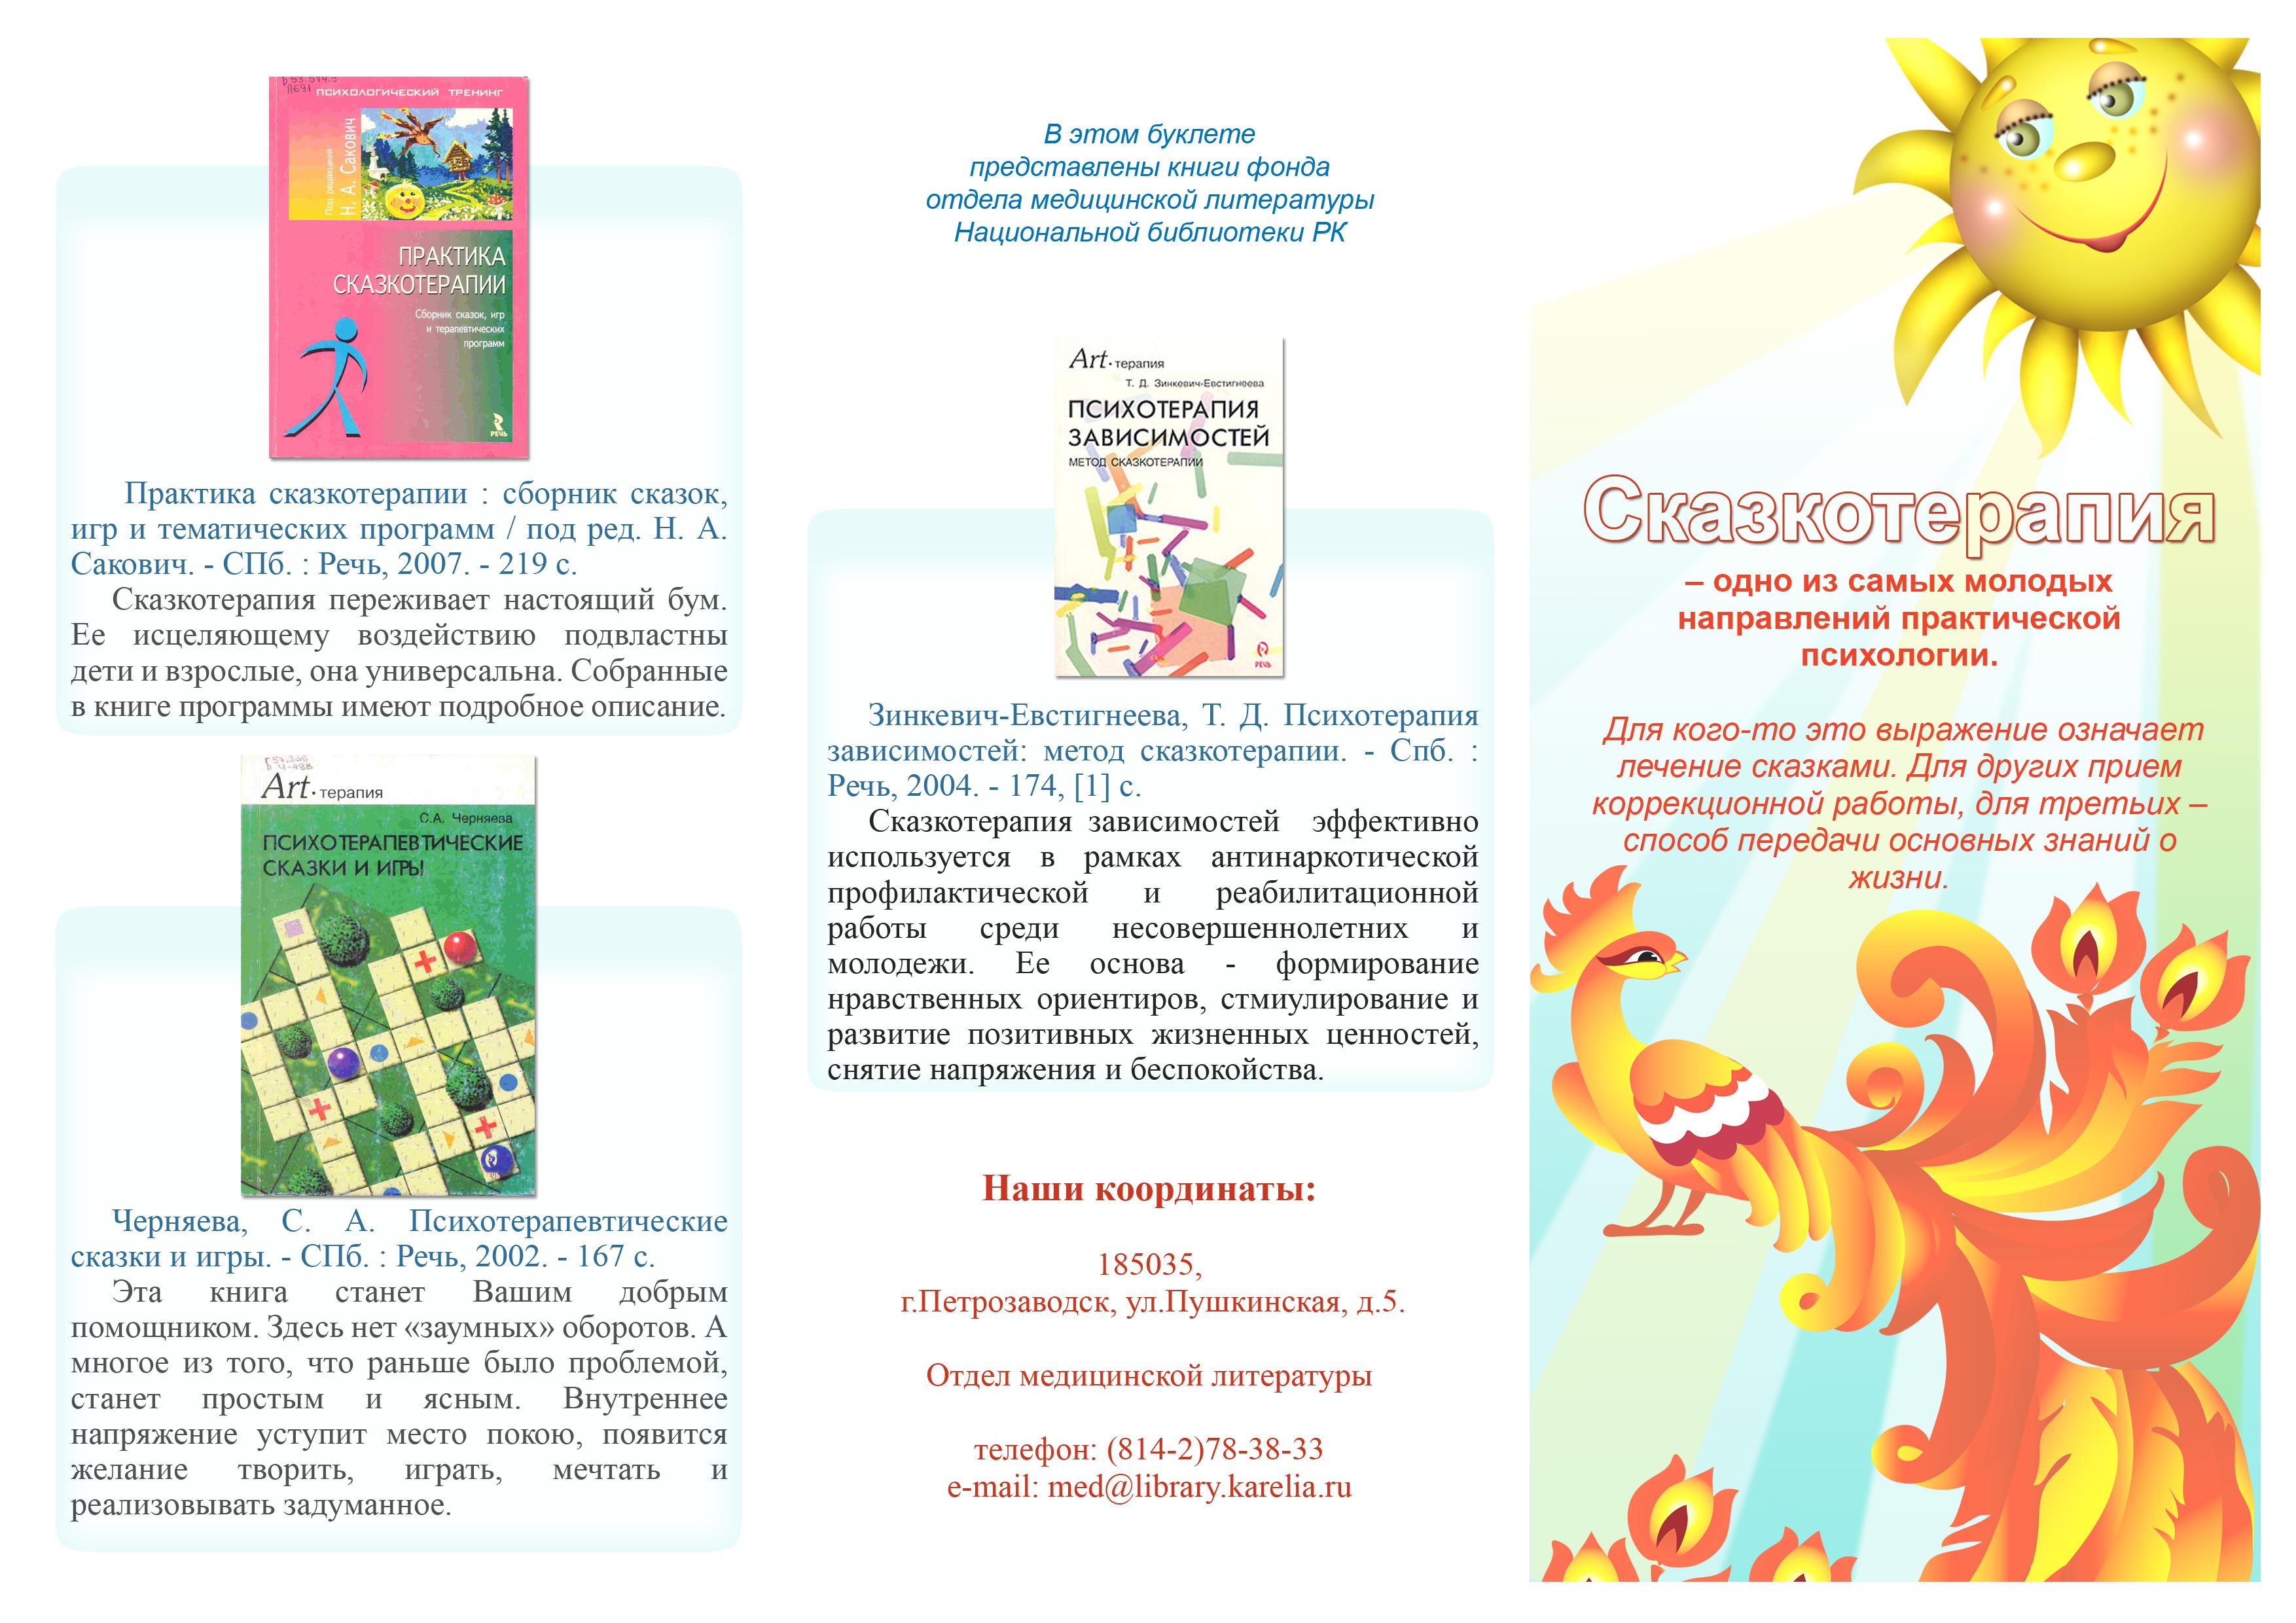 Сказкотерапия сказки - lad-lad ru